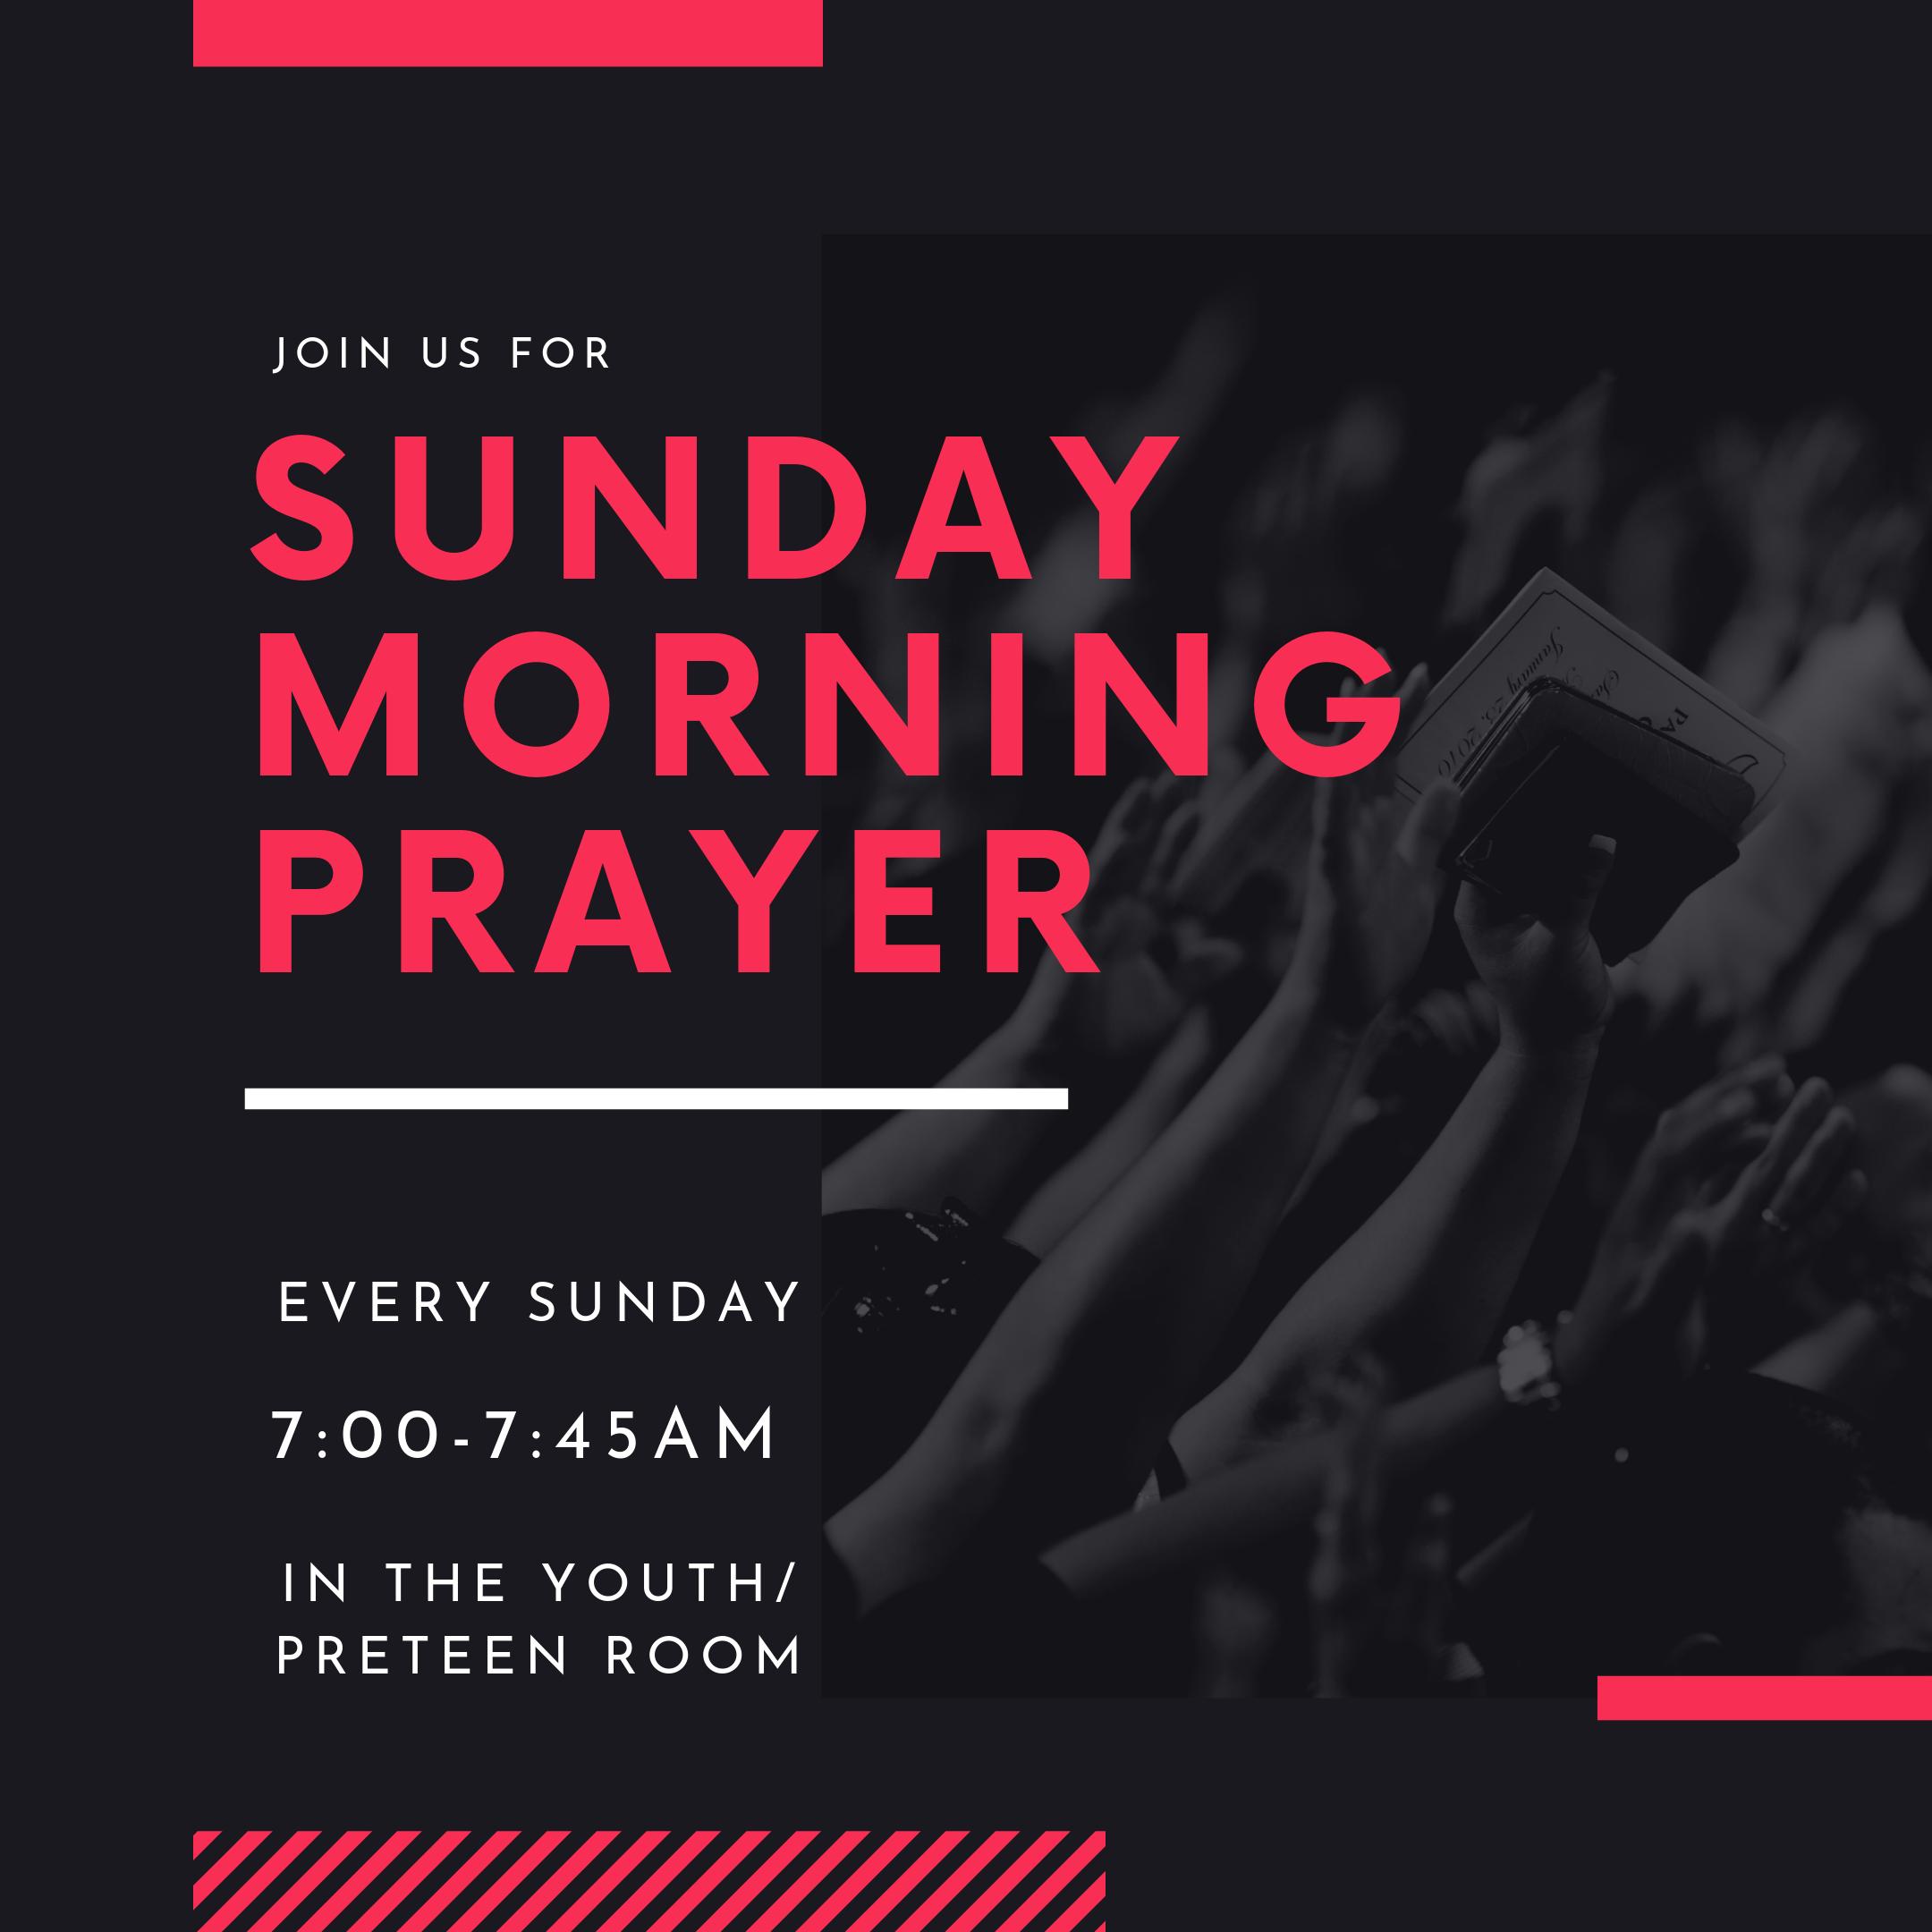 SUNDAY MORNING PRAYER.PNG